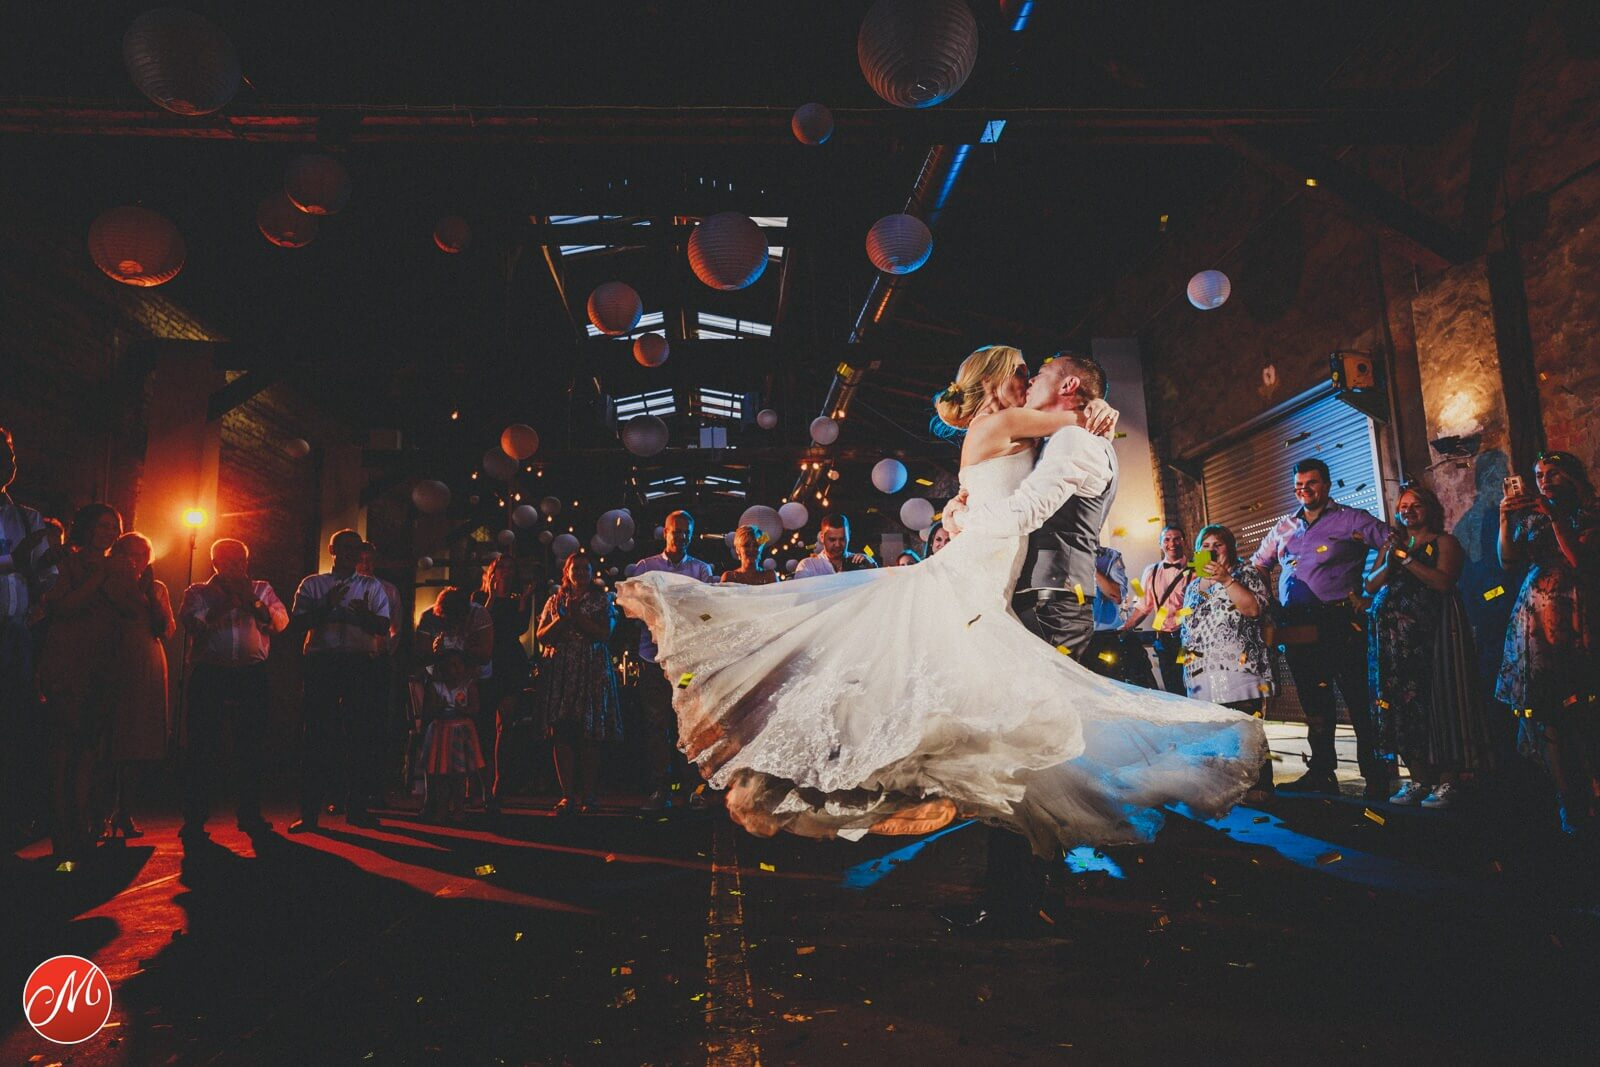 masters of german wedding photography - award nr. 49 - runde 22 - hochzeitsfoto-wettbewerb